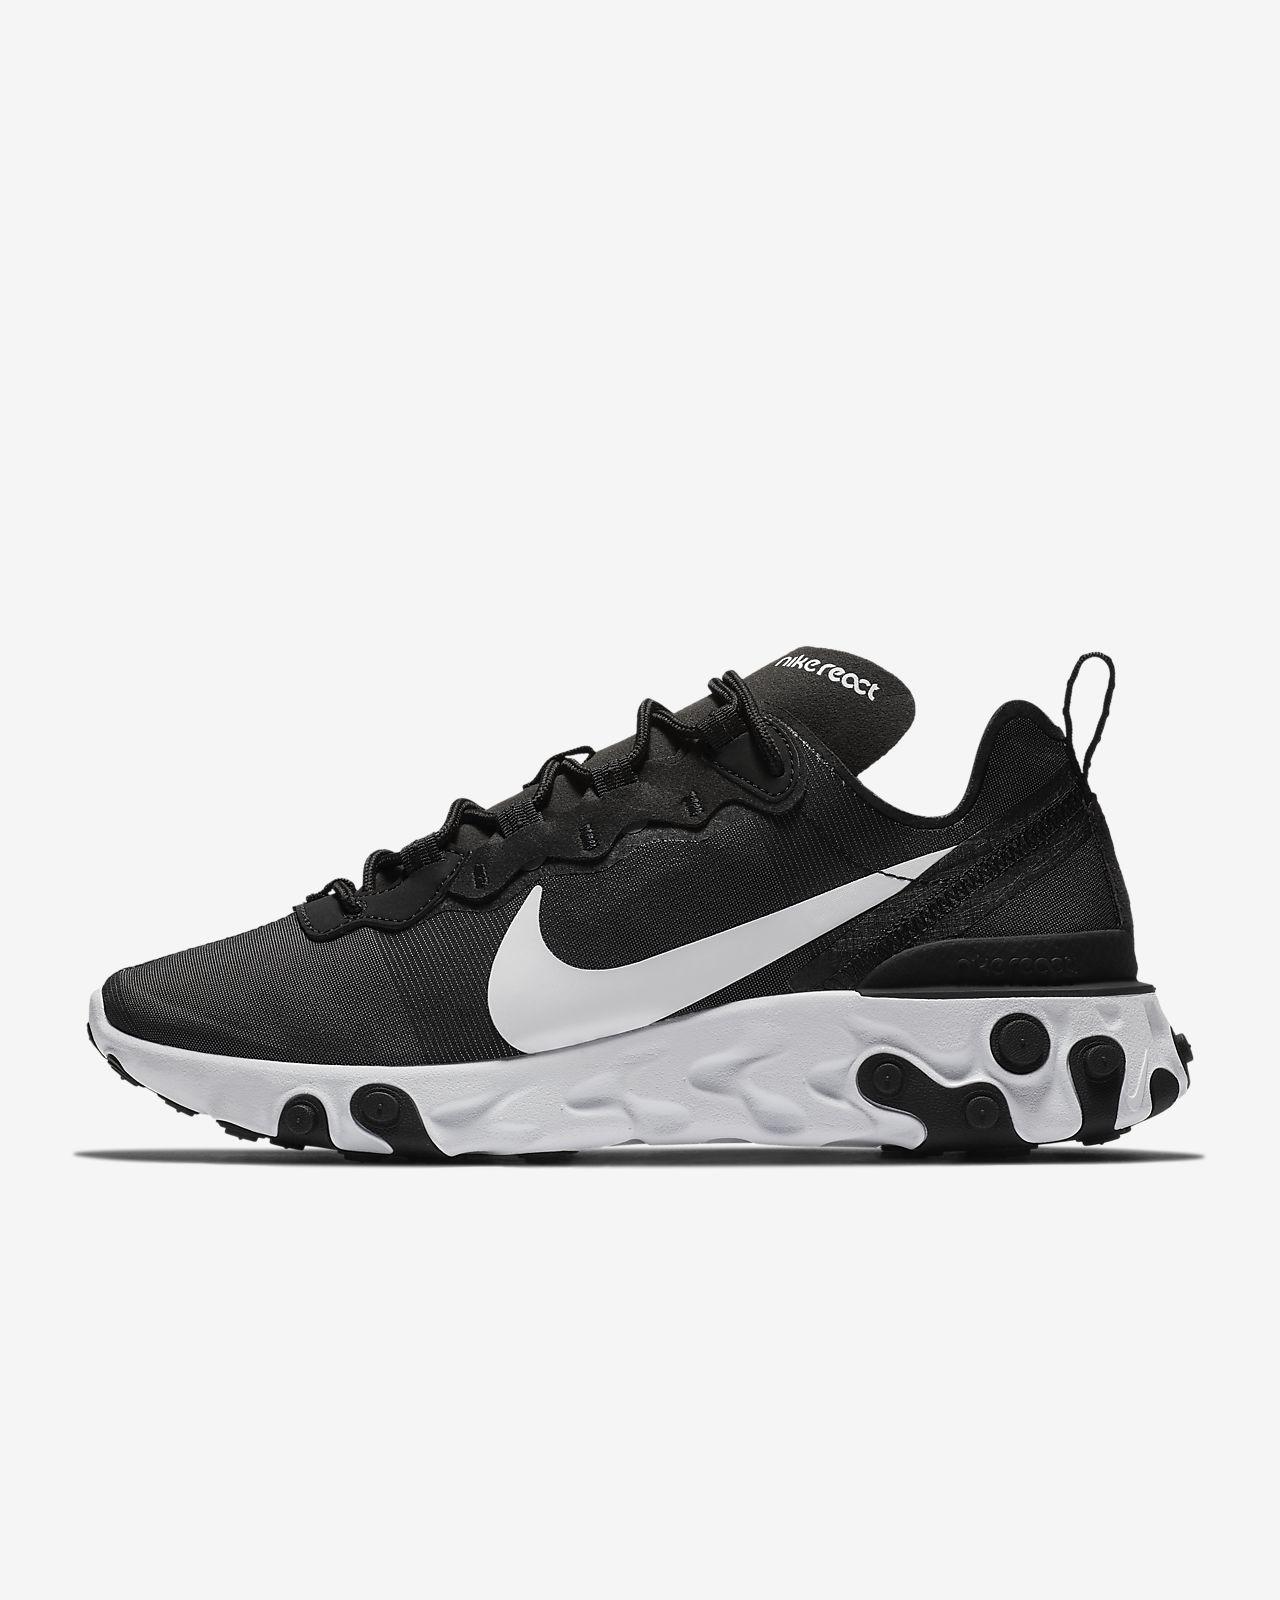 new arrival 2310d 86a25 ... Nike React Element 55 Kadın Ayakkabısı